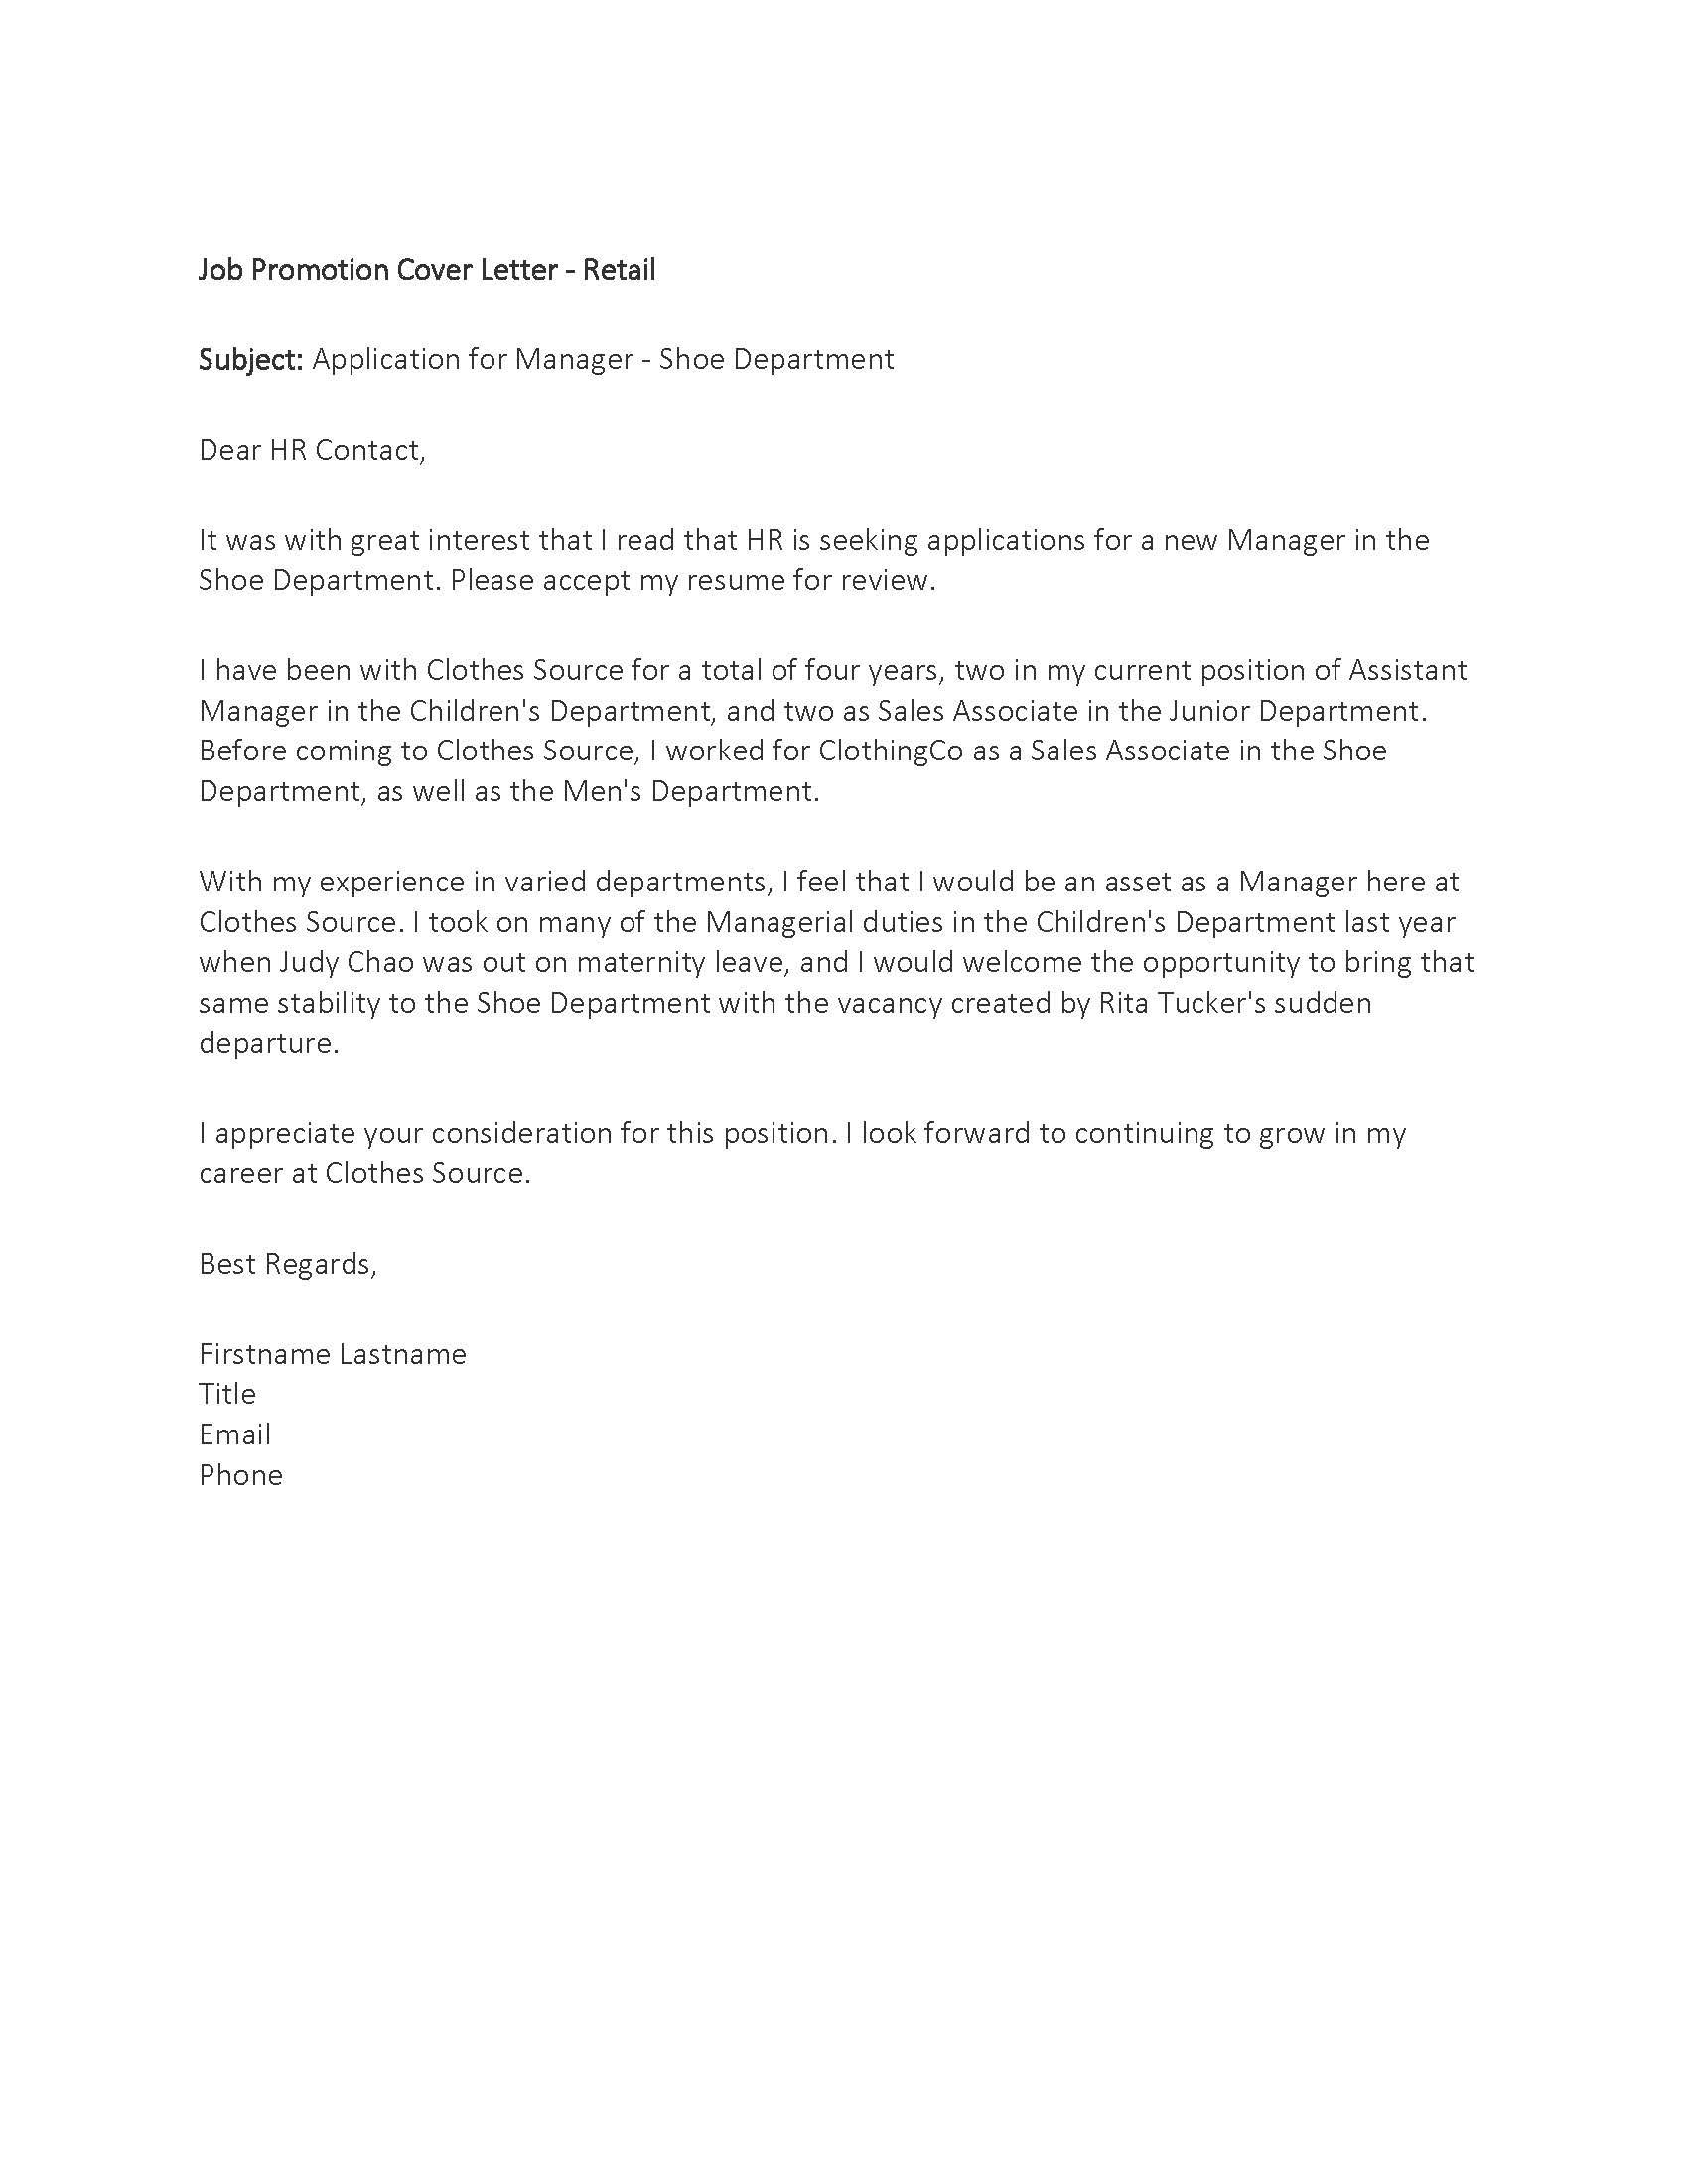 resume cover letter for job promotion